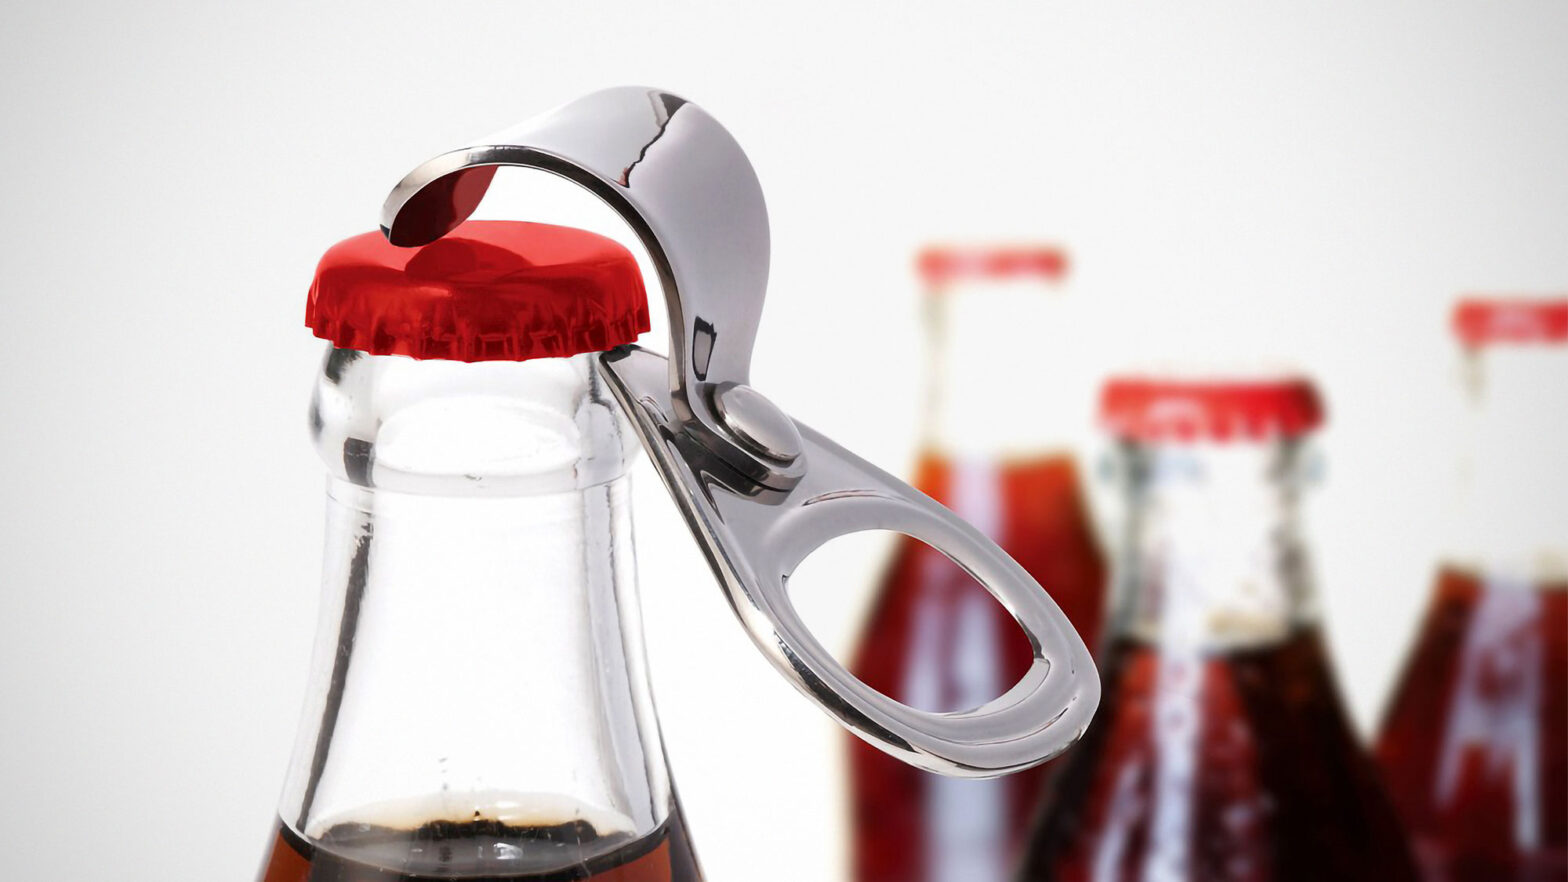 Can Pull Tab Shape Bottle Opener